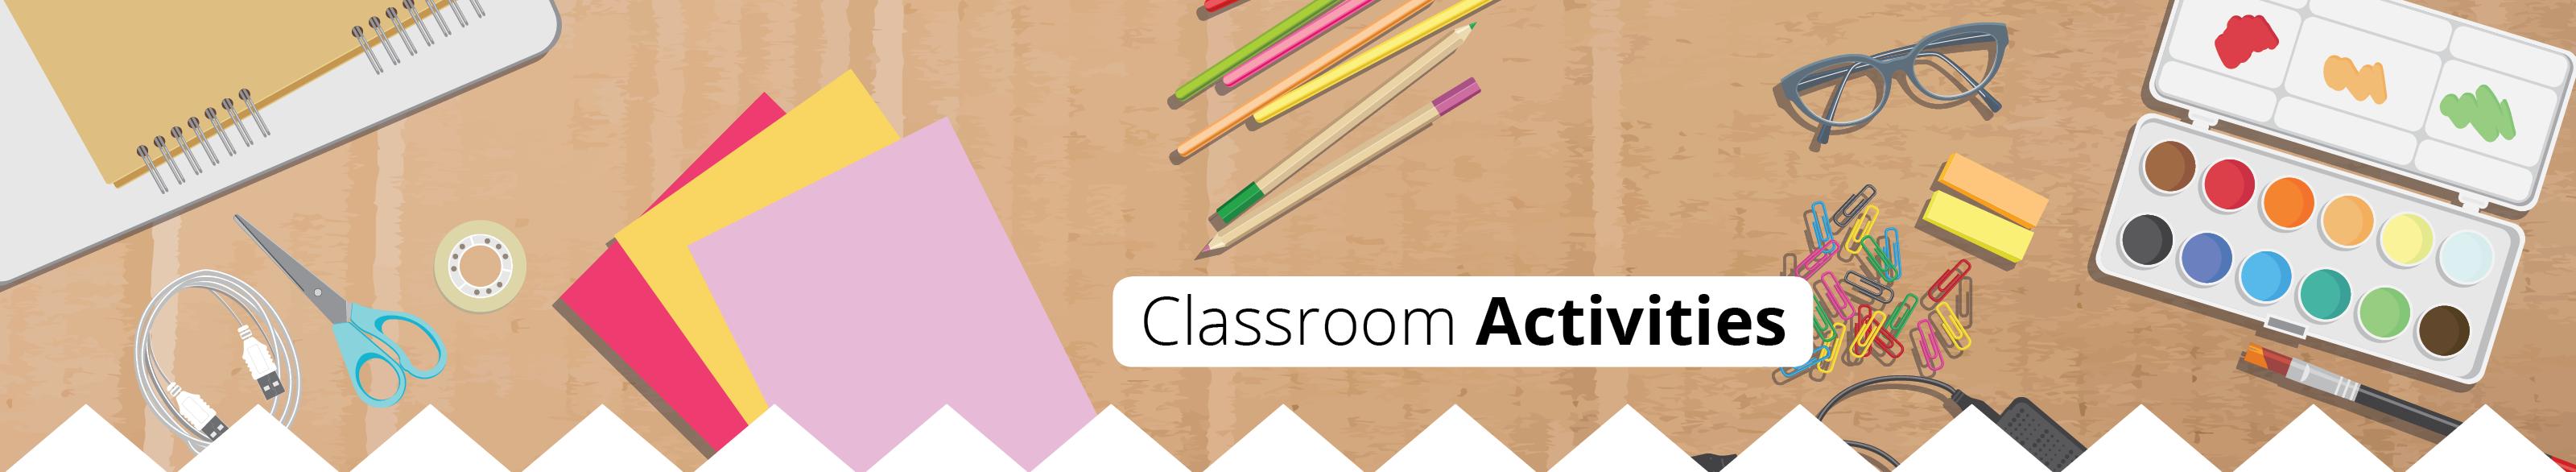 Classroom Activites